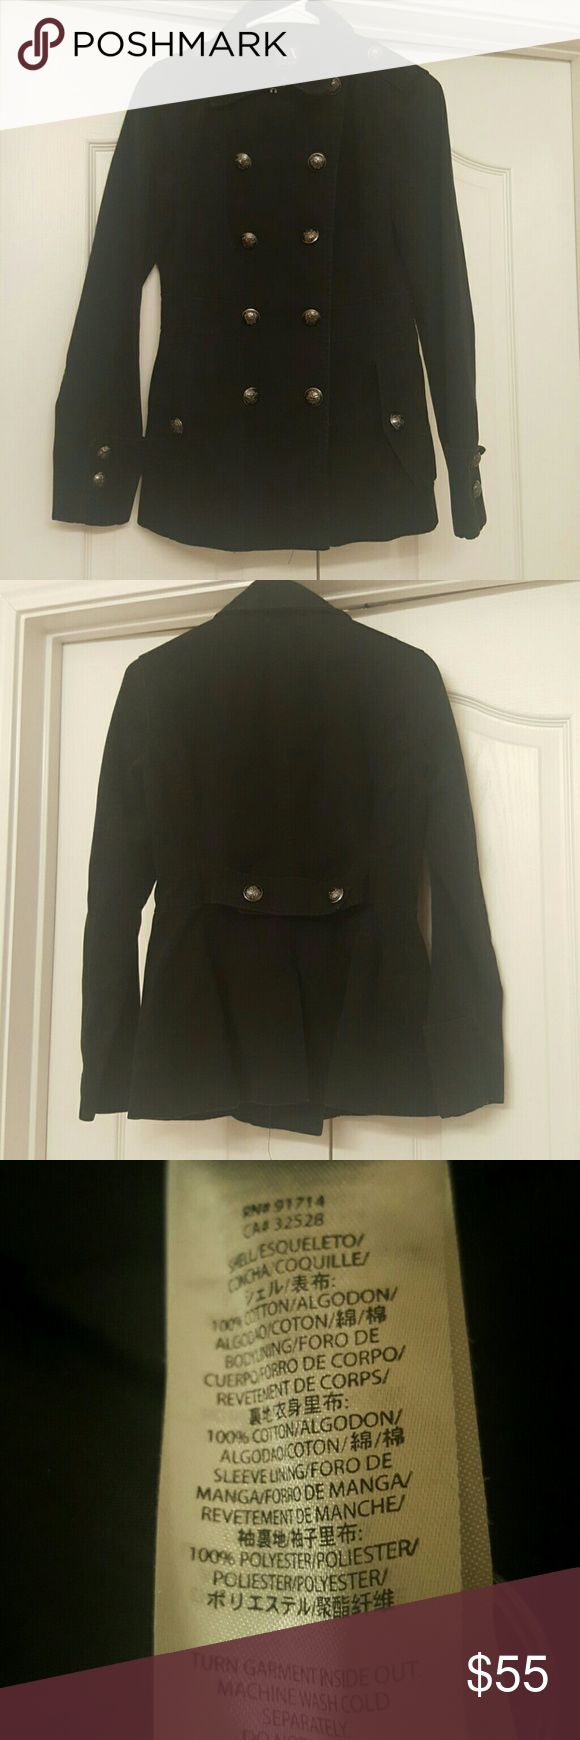 Armani Exchange Coat Military style. Perfect condition. 100% cotton. Dark blue. Armani Exchange Jackets & Coats